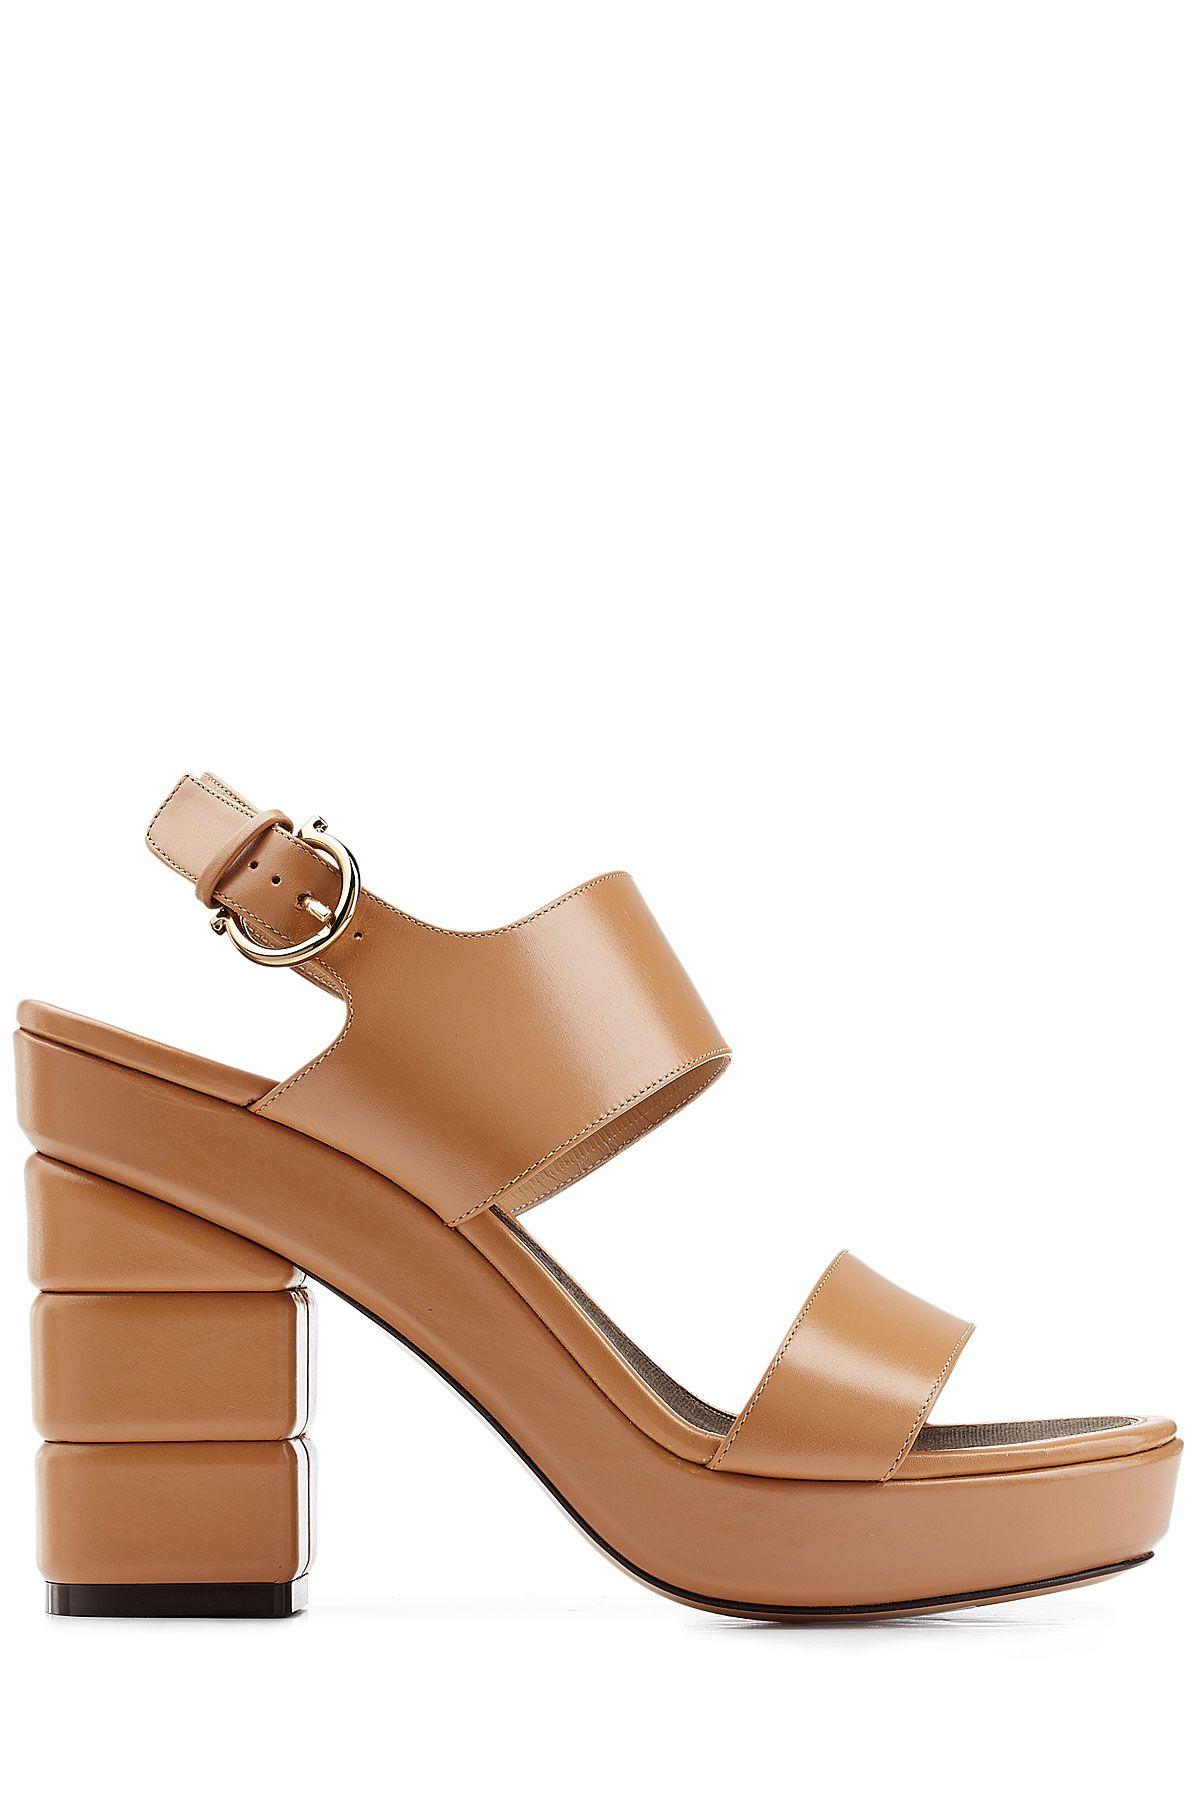 Leather Sandals from SALVATORE FERRAGAMO   Luxury fashion online    STYLEBOP.com 51d67c9338f8